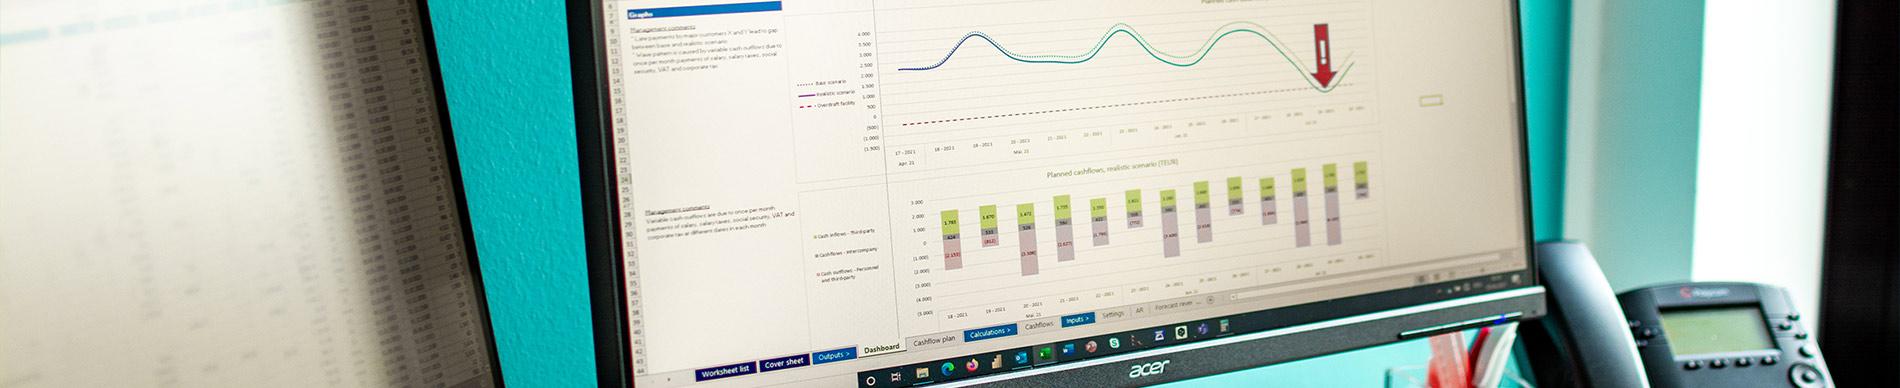 Knott Consulting Düsseldorf - Data-Analytics